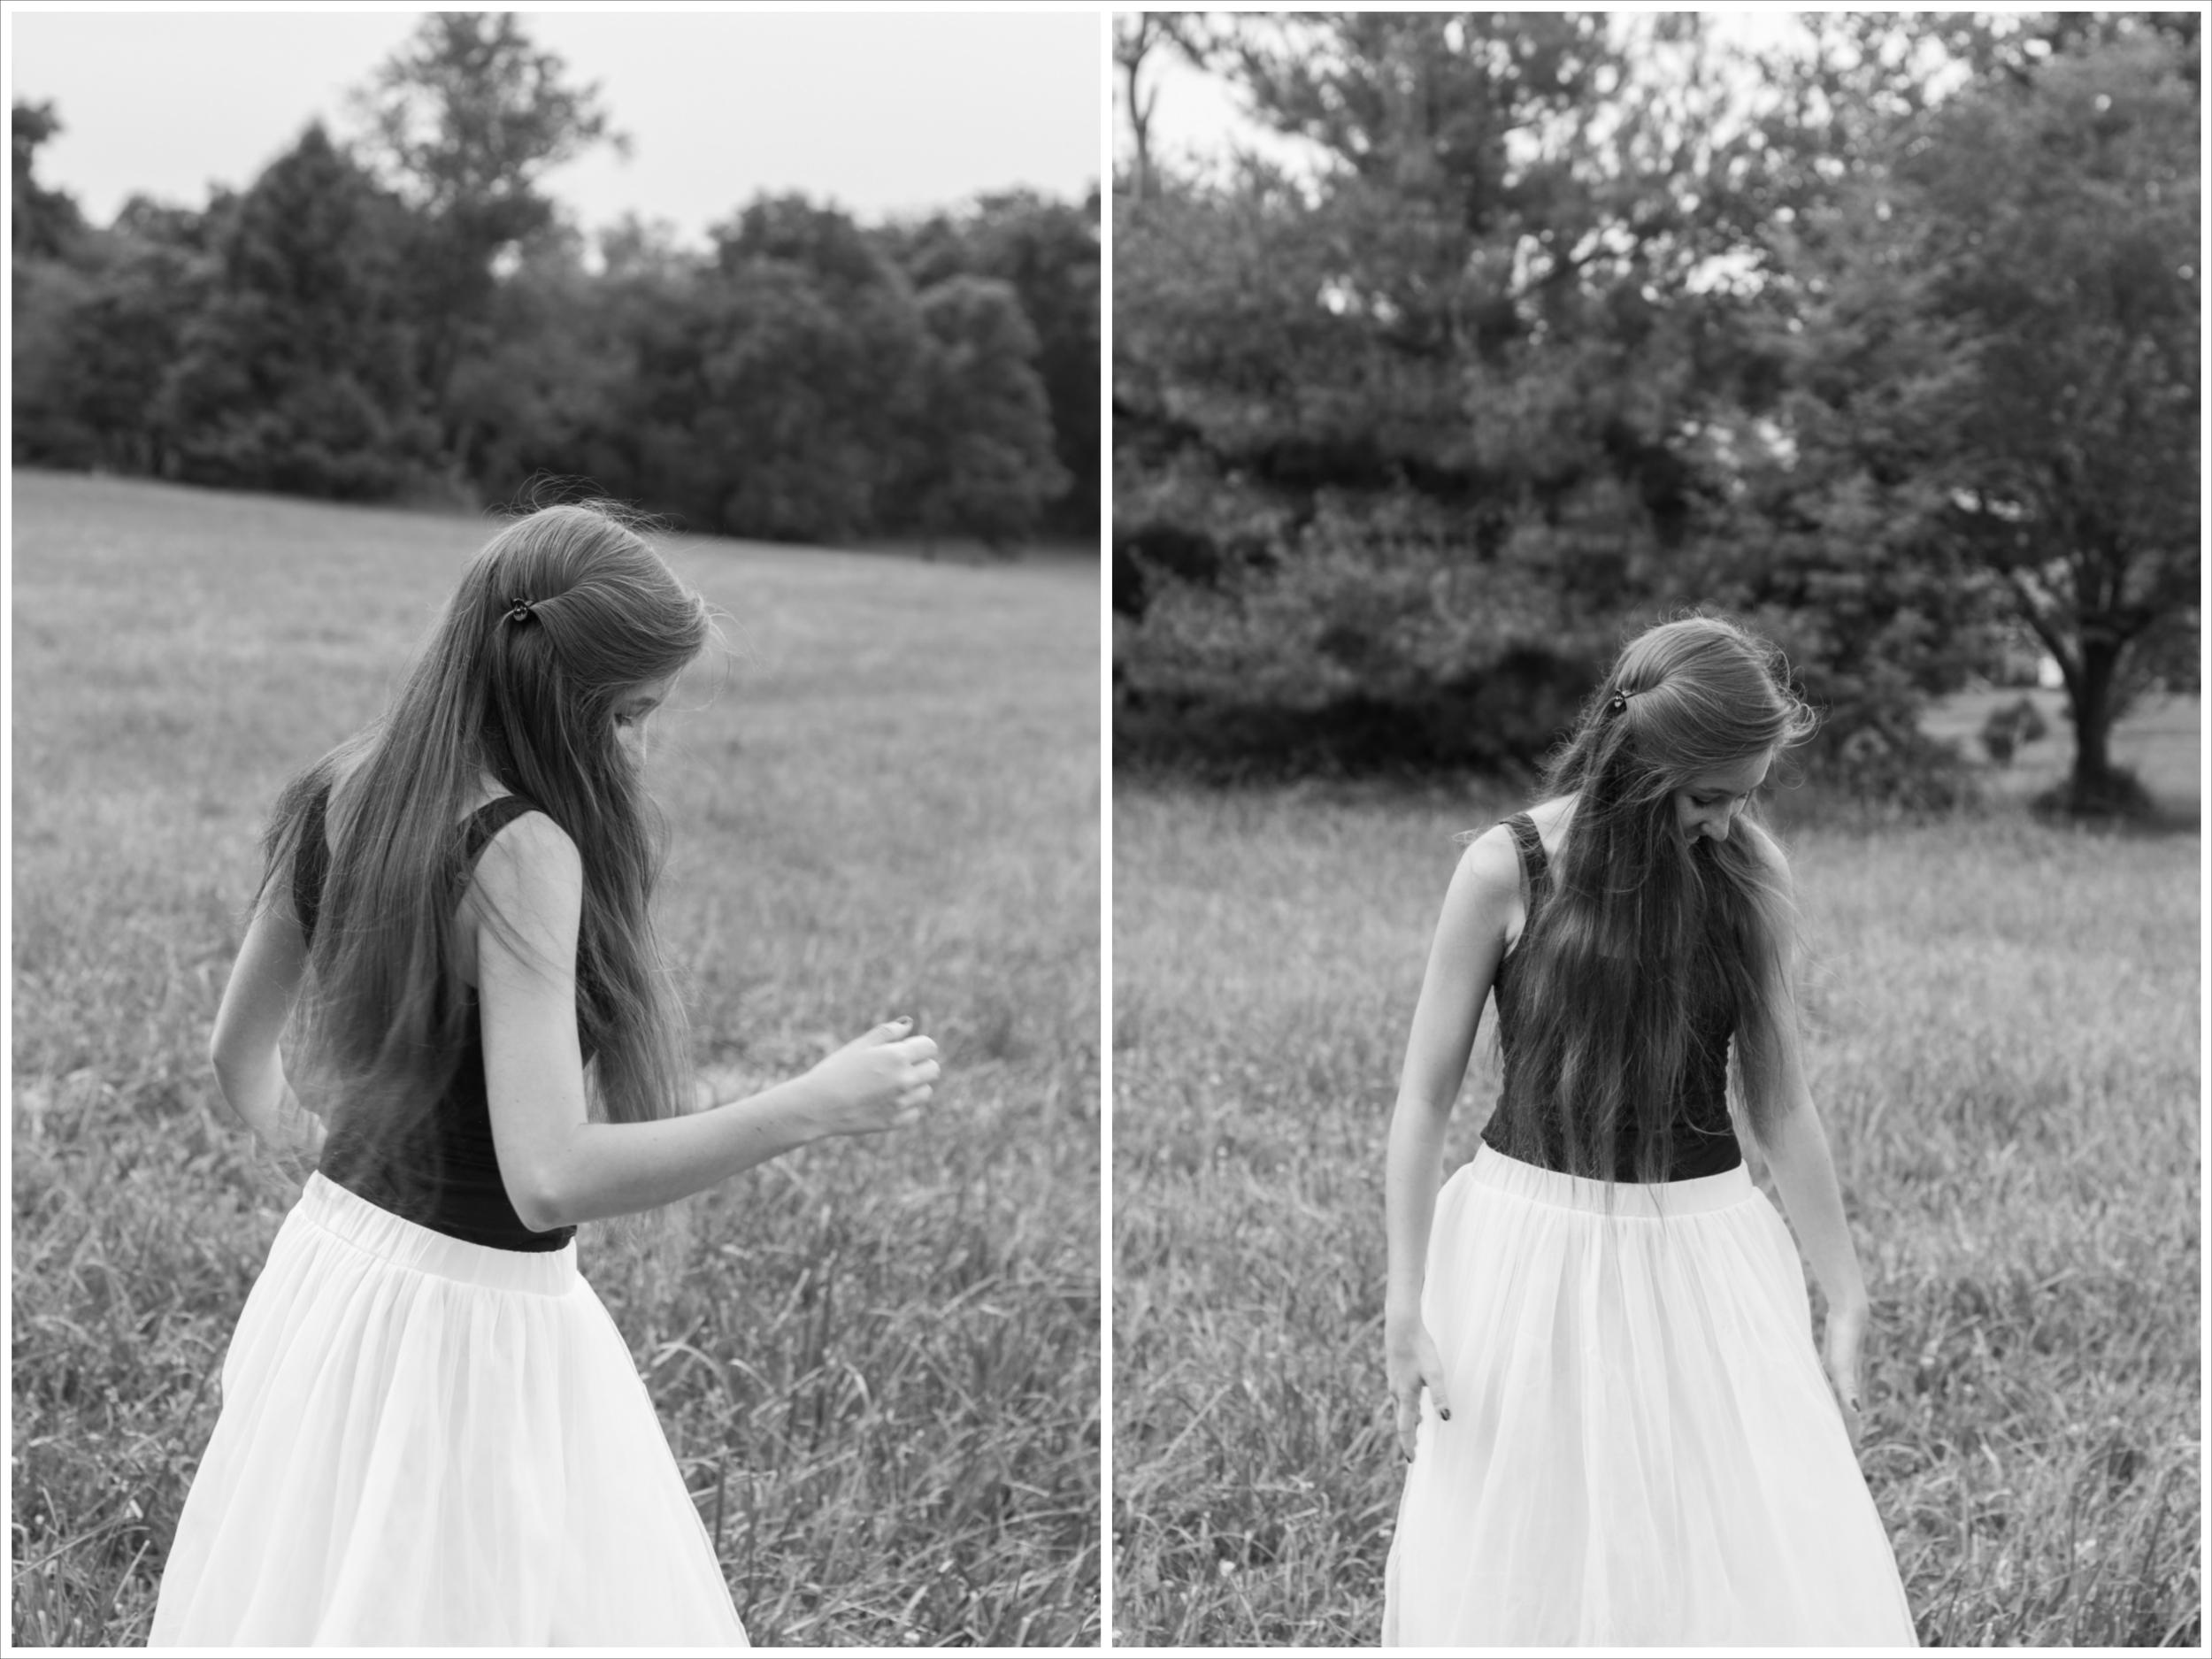 Emma-6362-2_Fotor_Collage.jpg